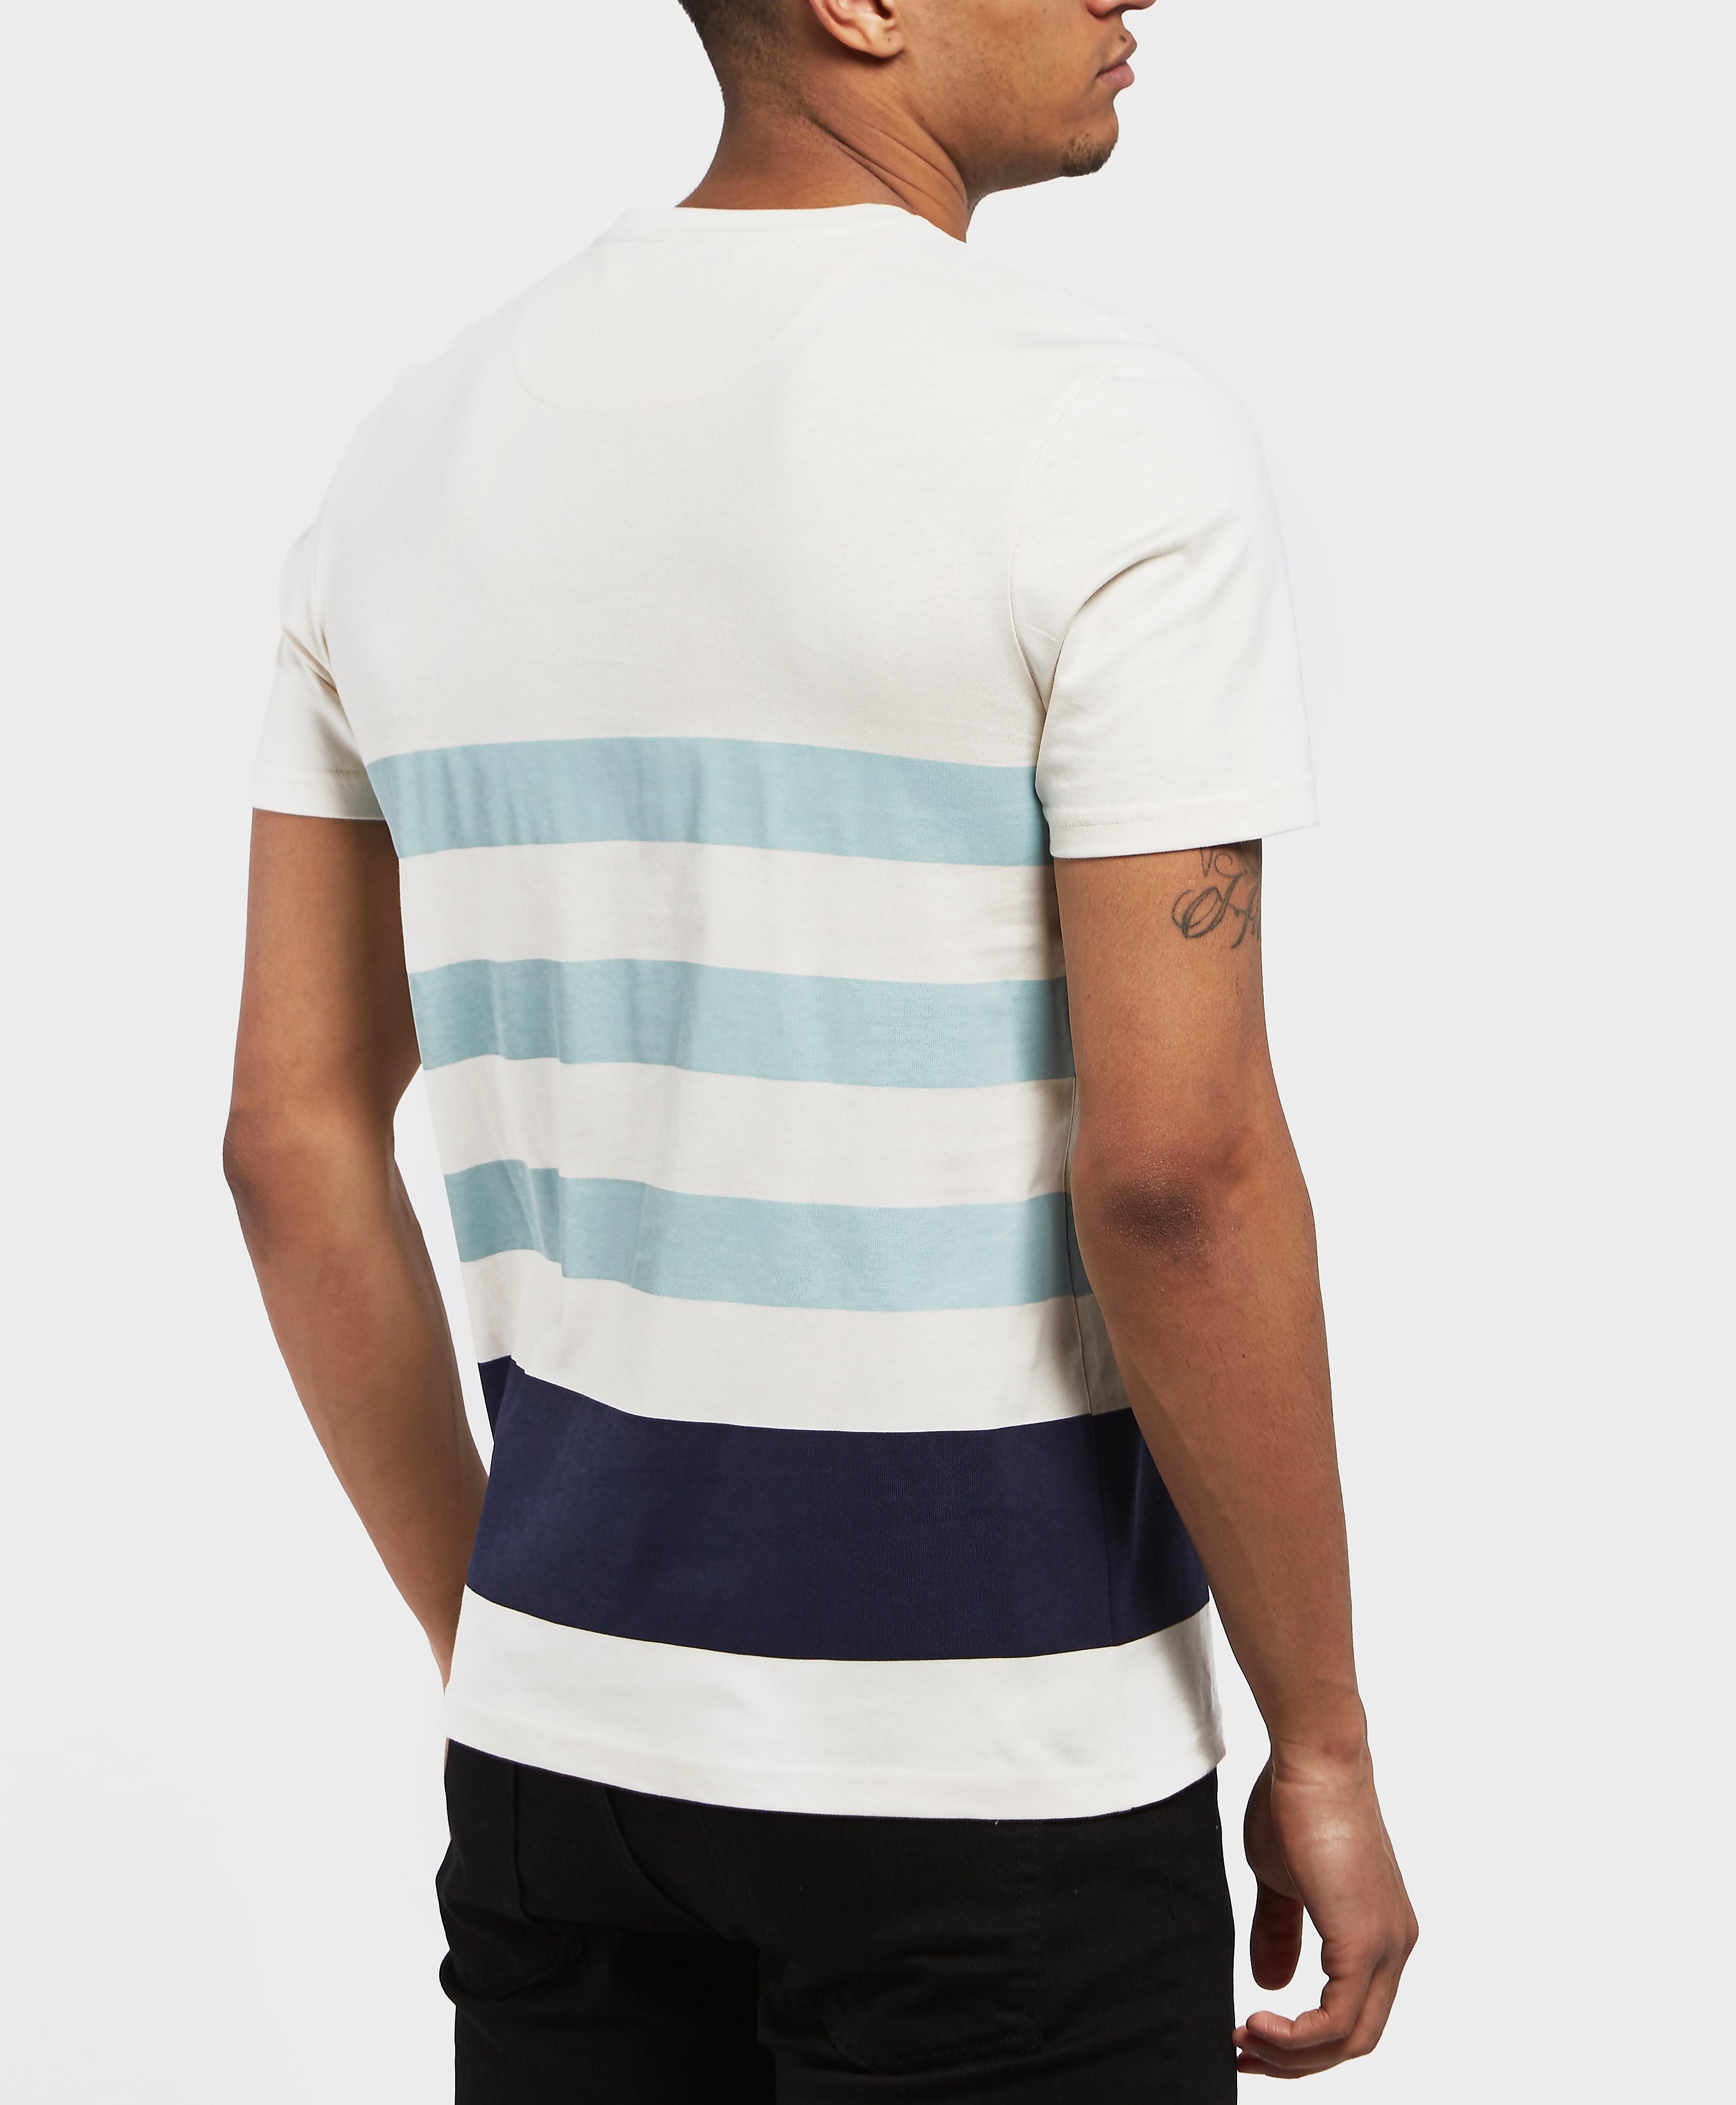 Lyle & Scott Stripe Pocket Short Sleeve T-Shirt